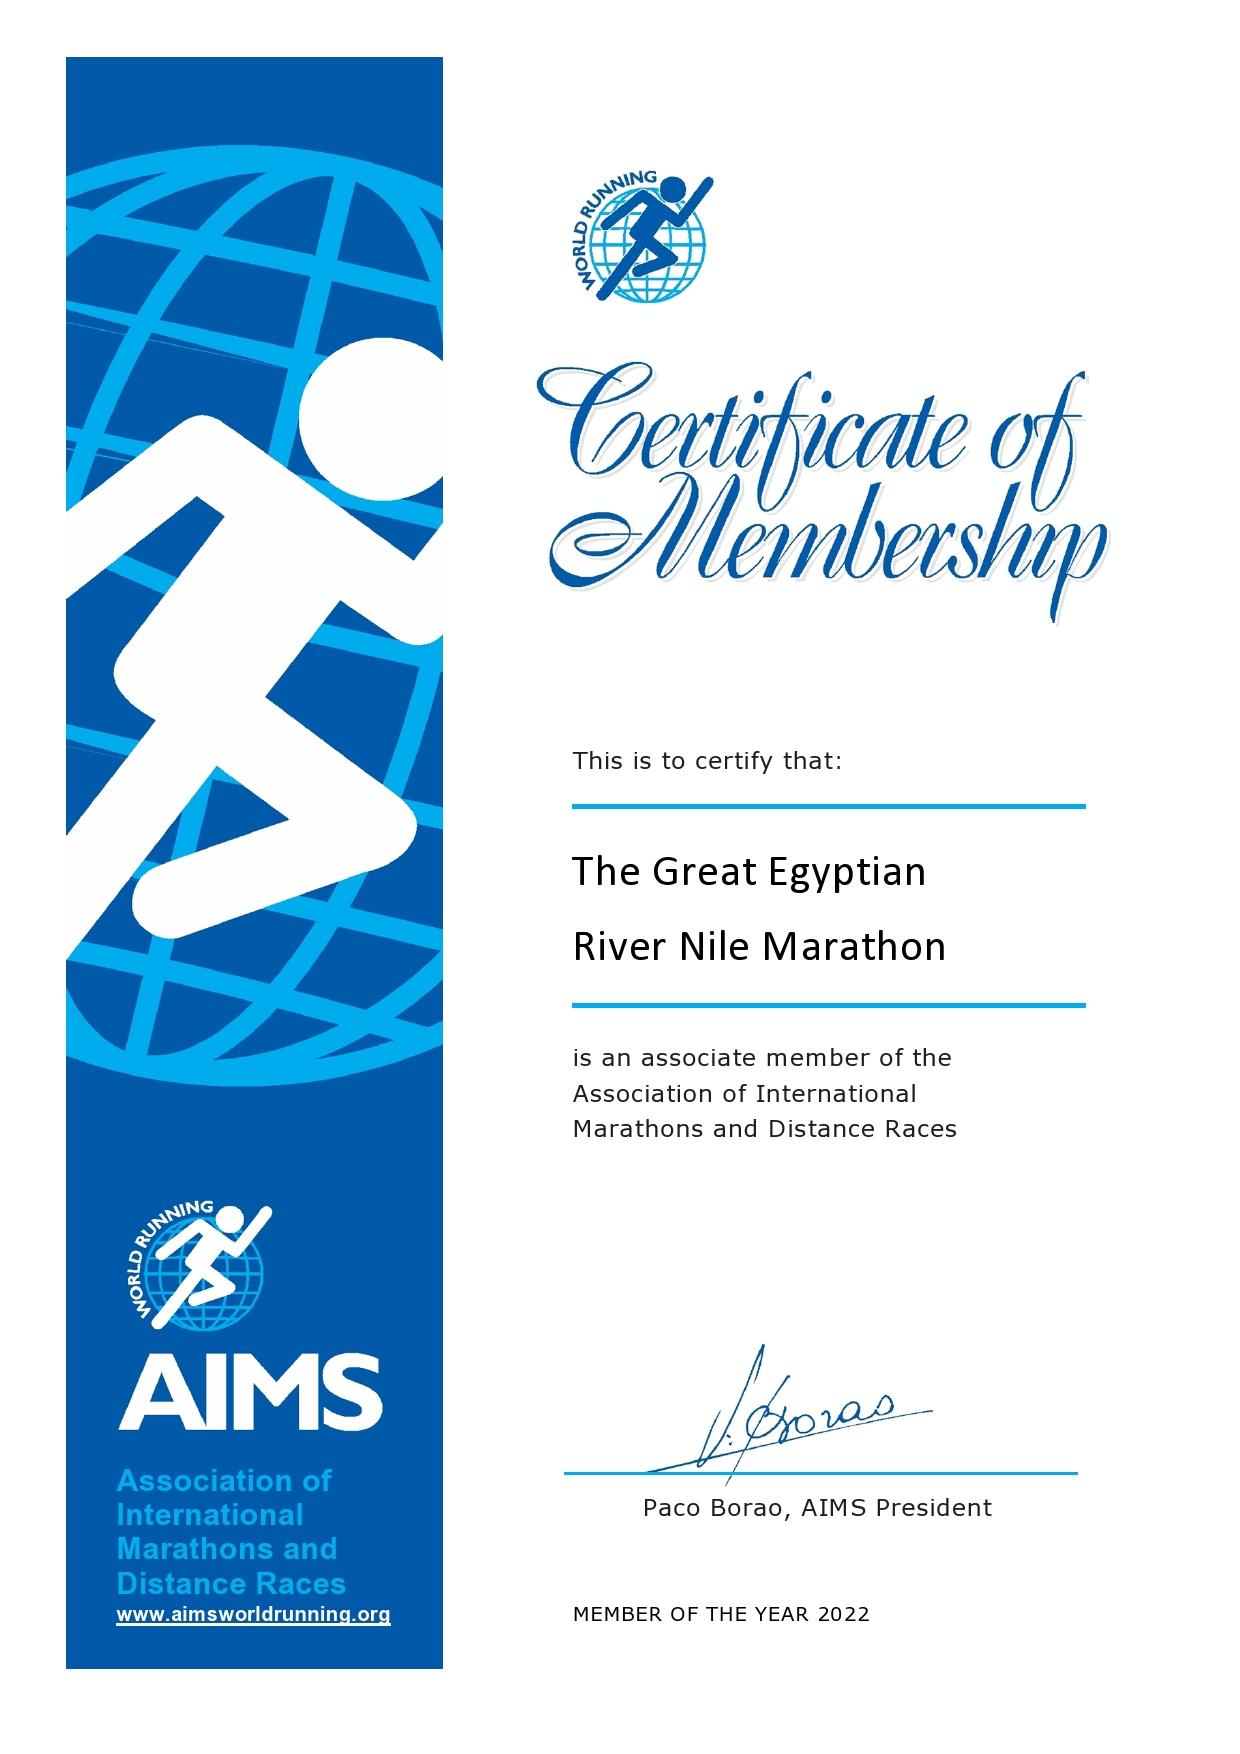 Break News First WA/Aims Certified Full Marathon in Cairo